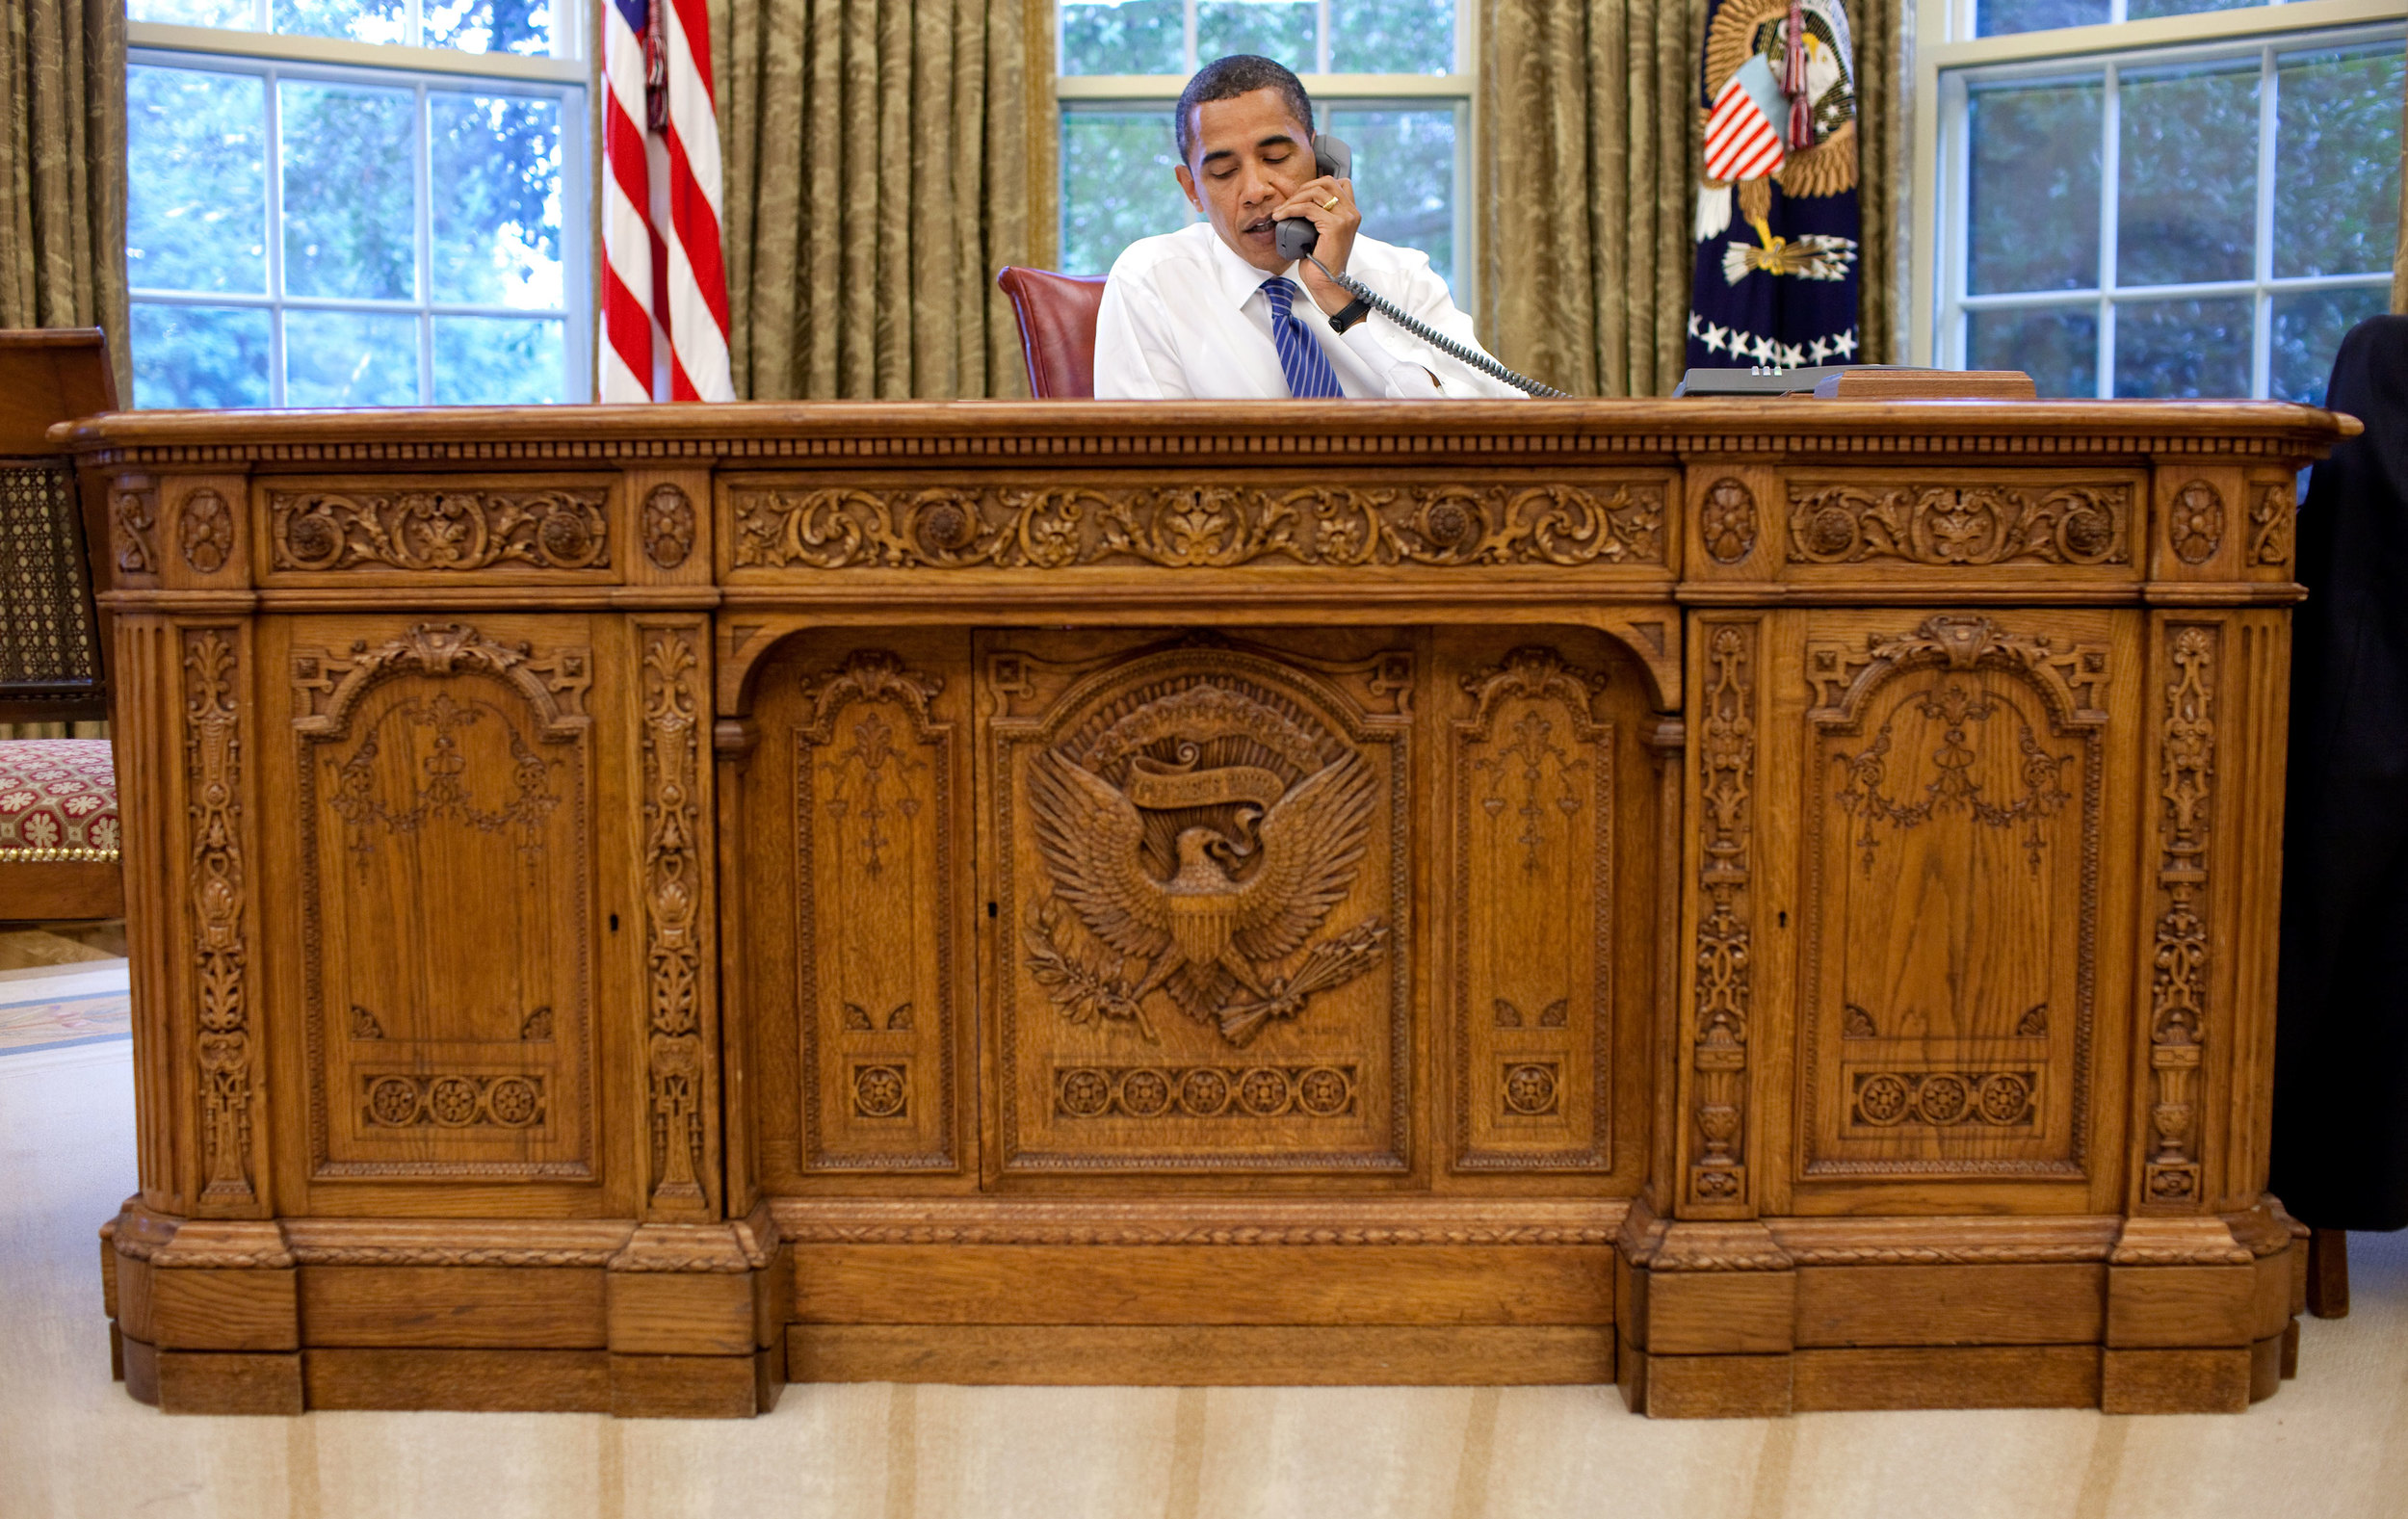 Barack Obama sitting at the Resolute Desk